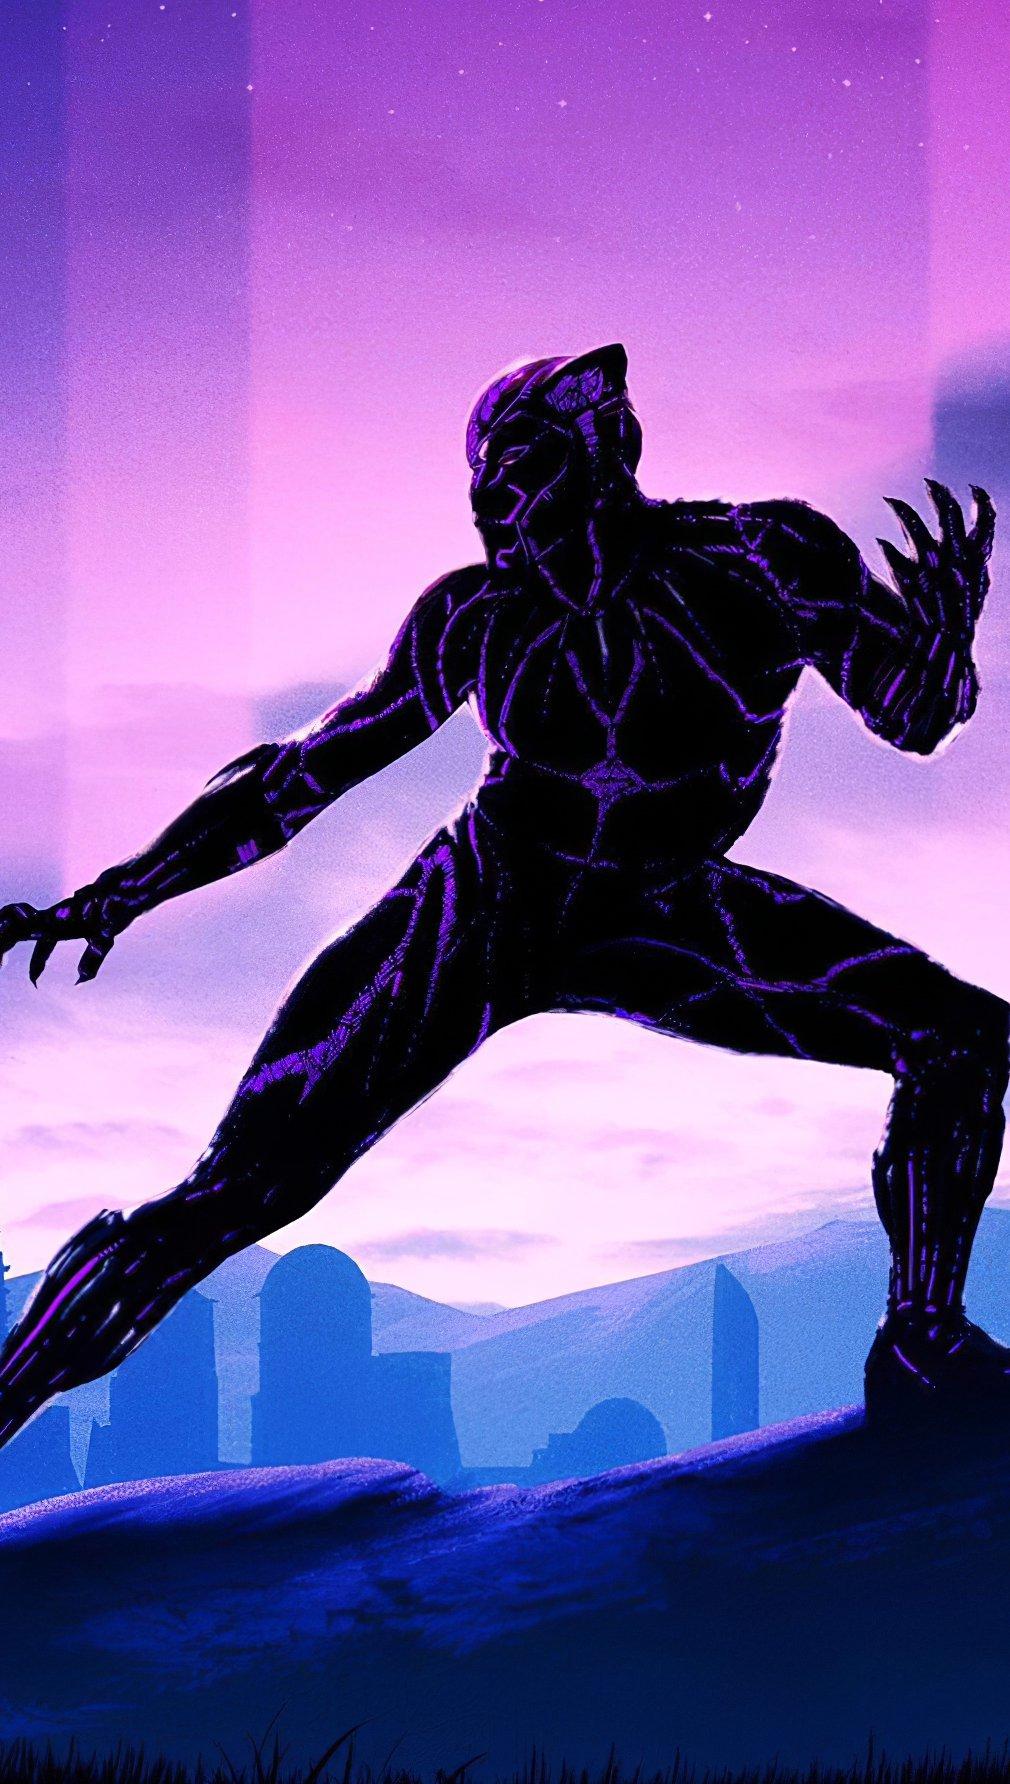 Fondos de pantalla Pantera negra 2020 Vertical